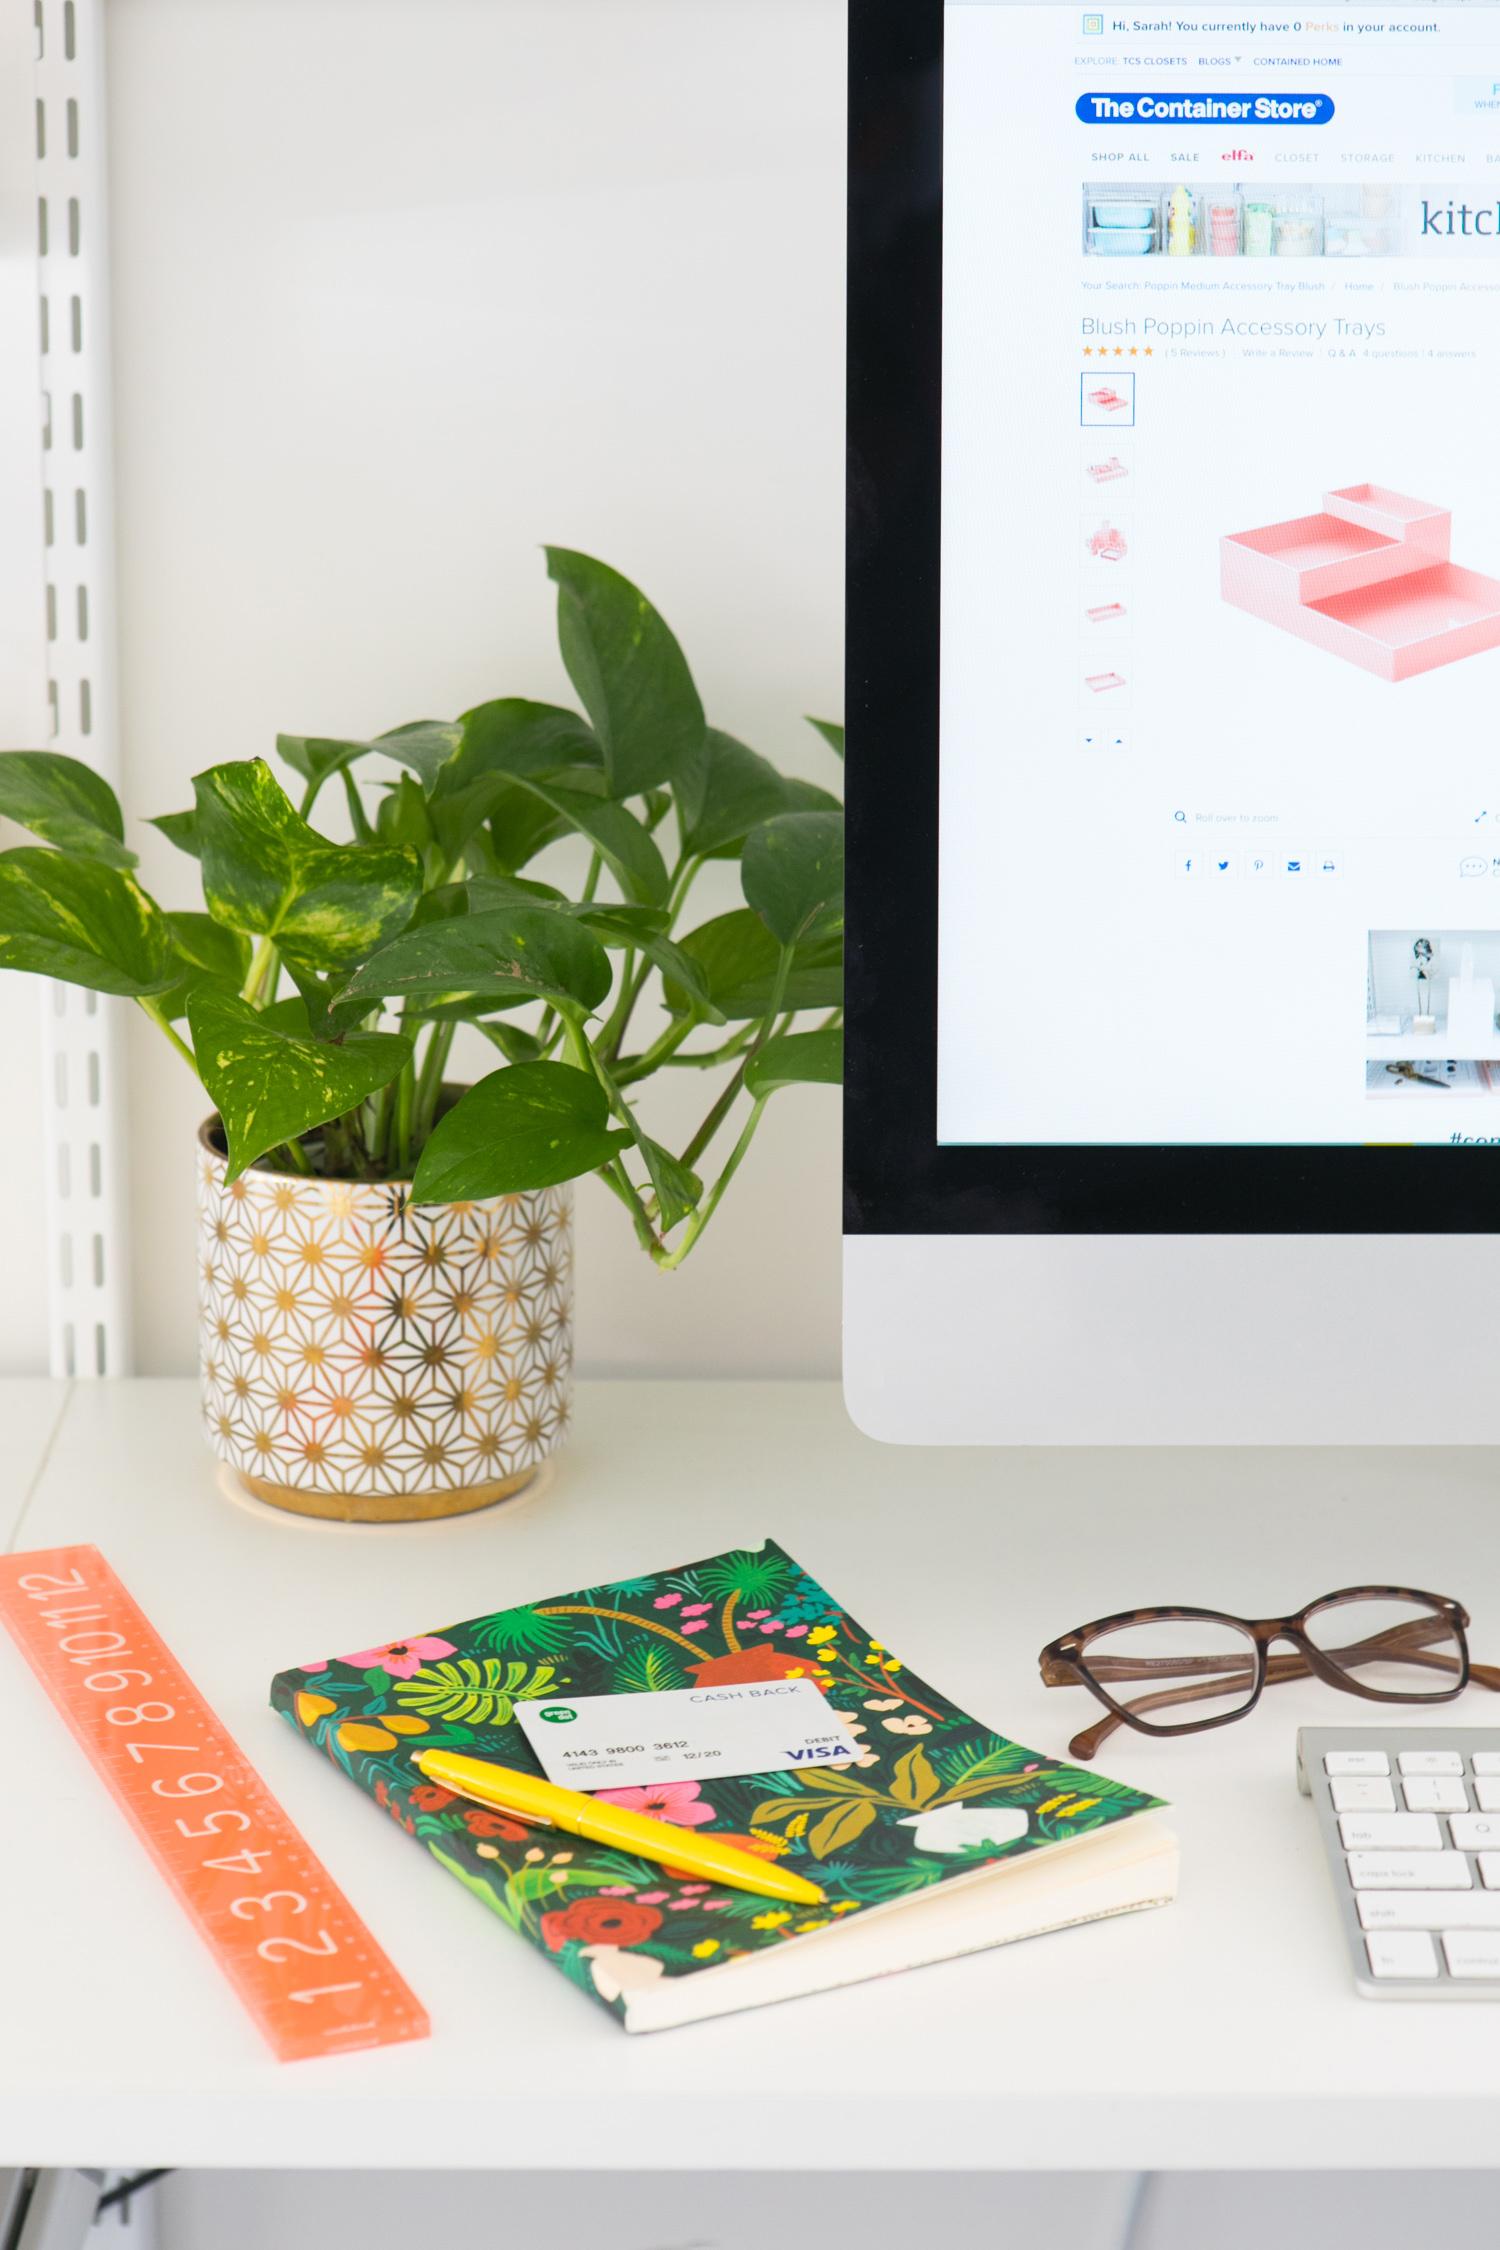 Photo of Sarah's desk